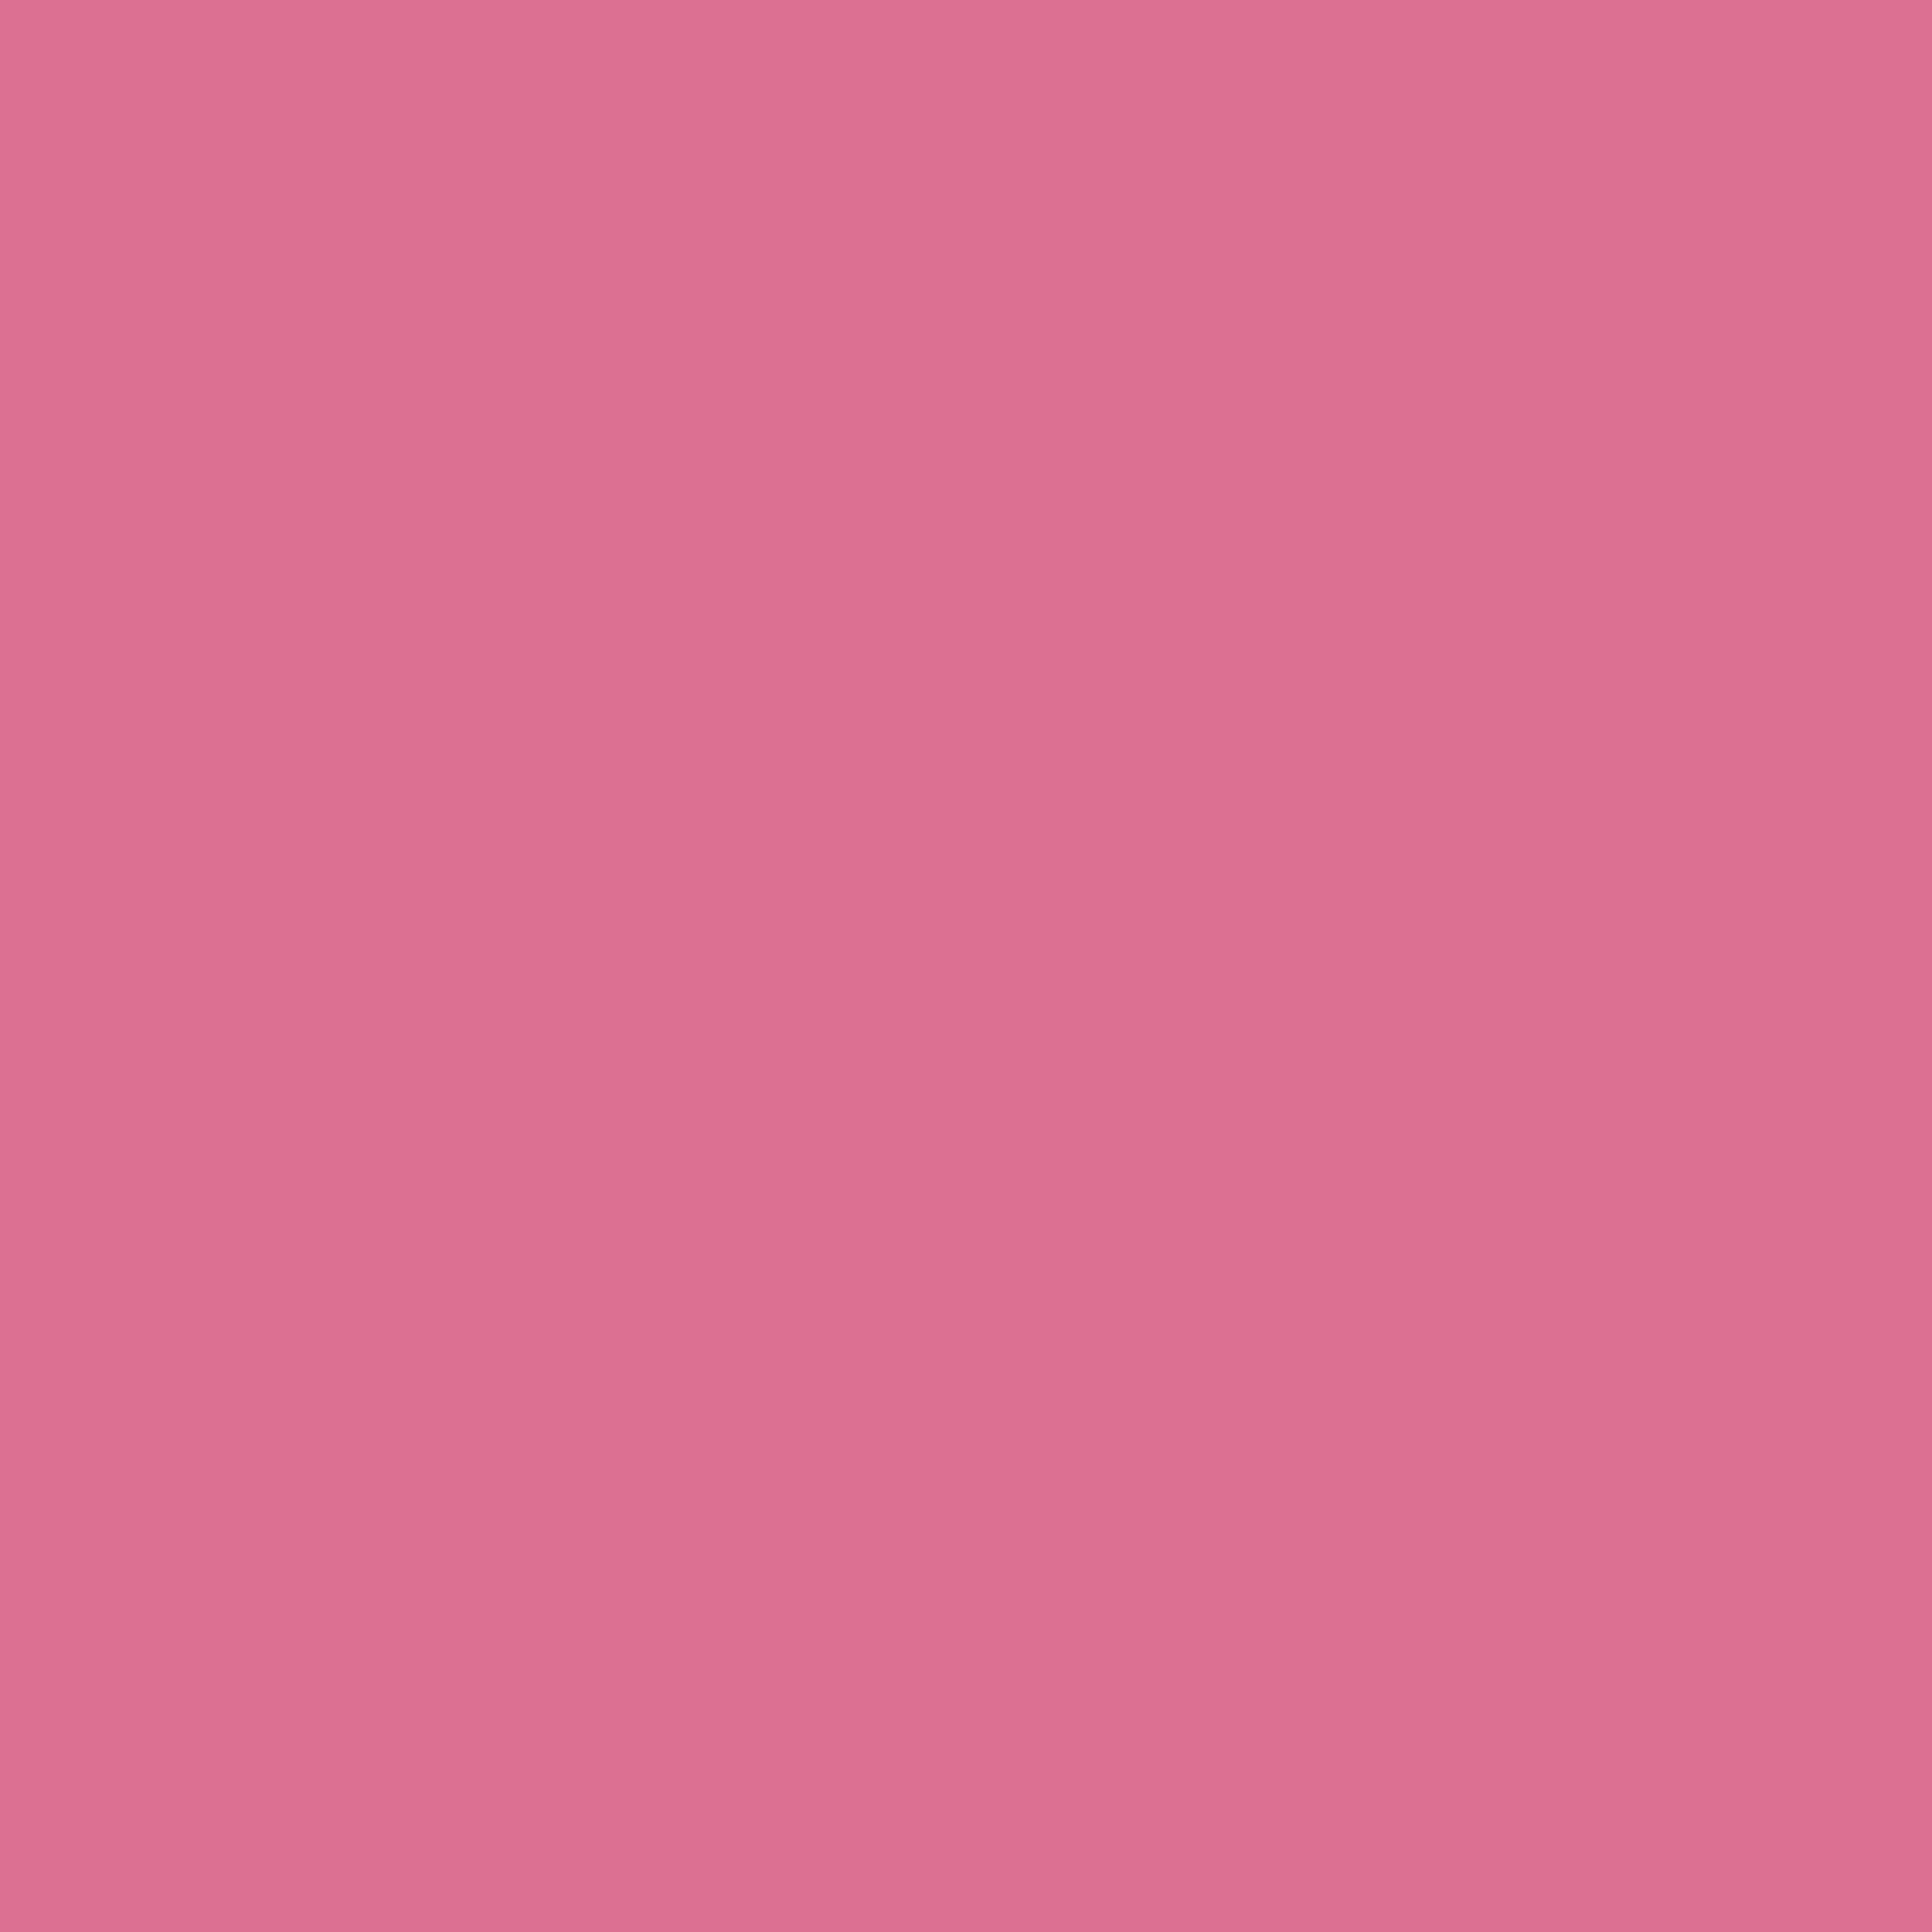 2048x2048 Pale Violet-red Solid Color Background